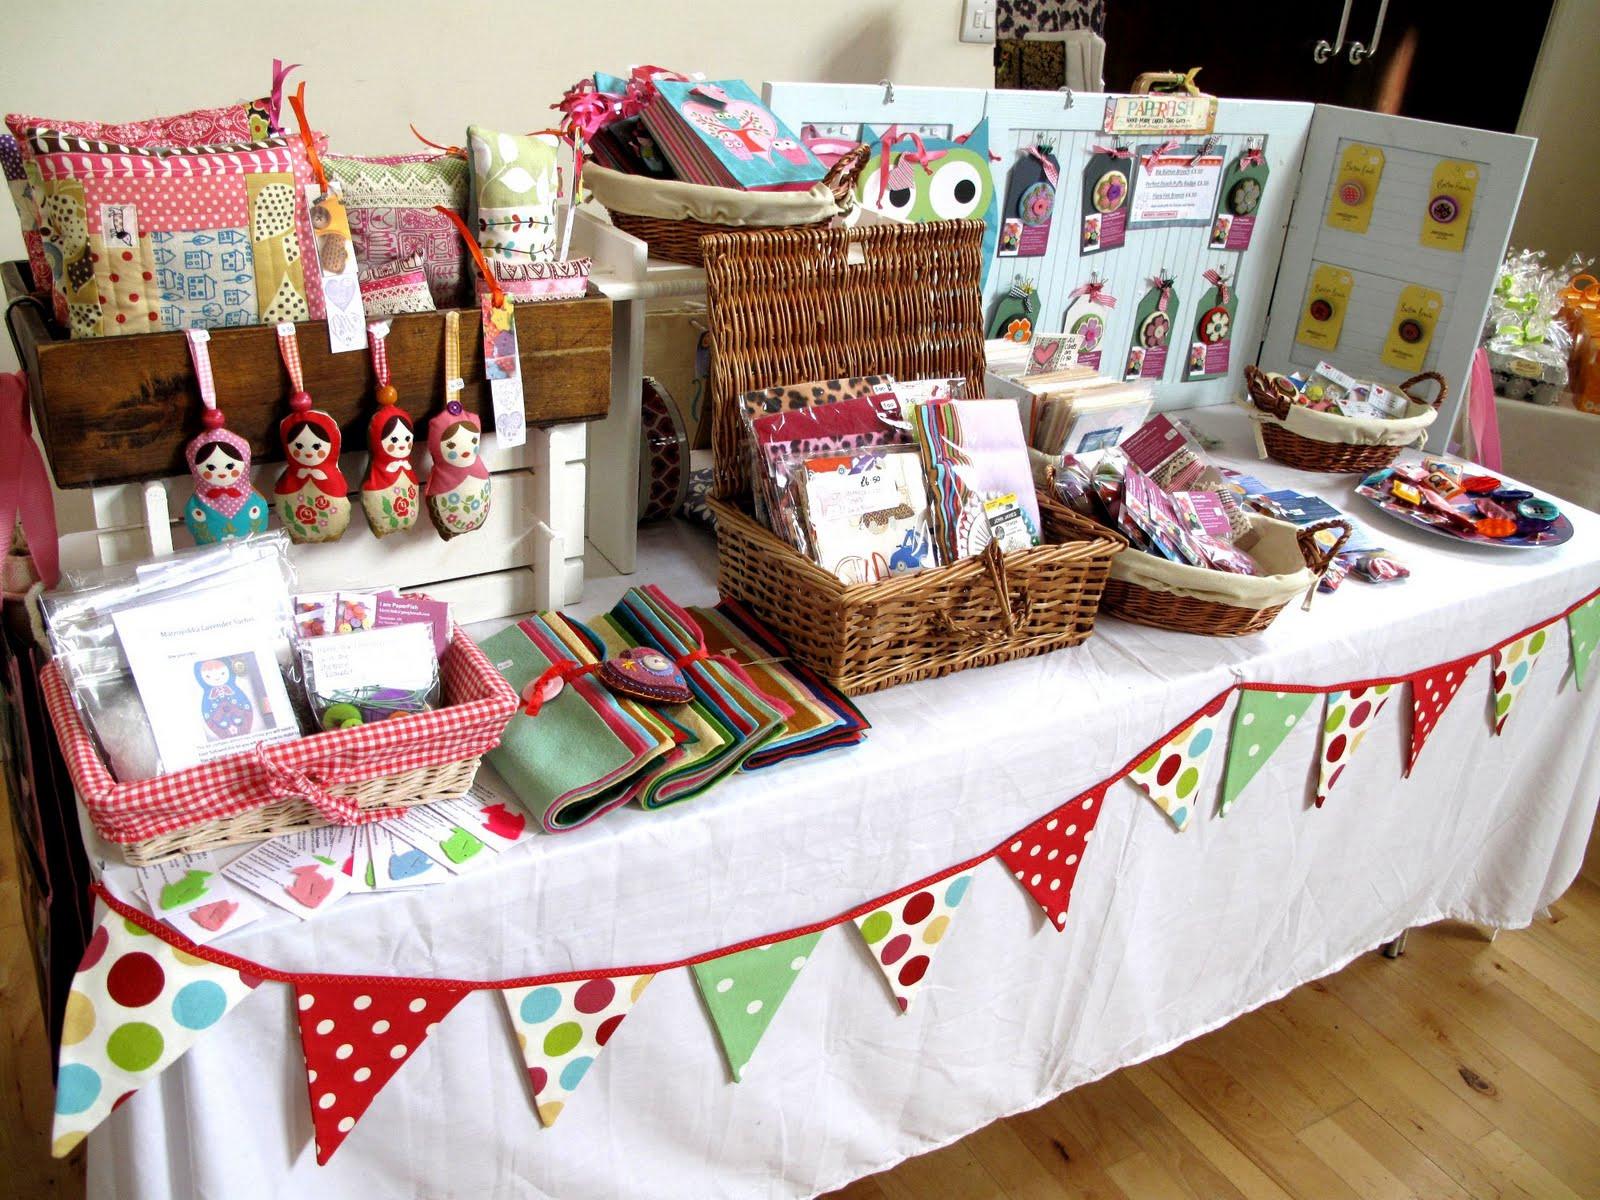 Christmas Craft Fair Ideas  Little Sugar Plums Delapre Abbey Annual Christmas Craft Fair